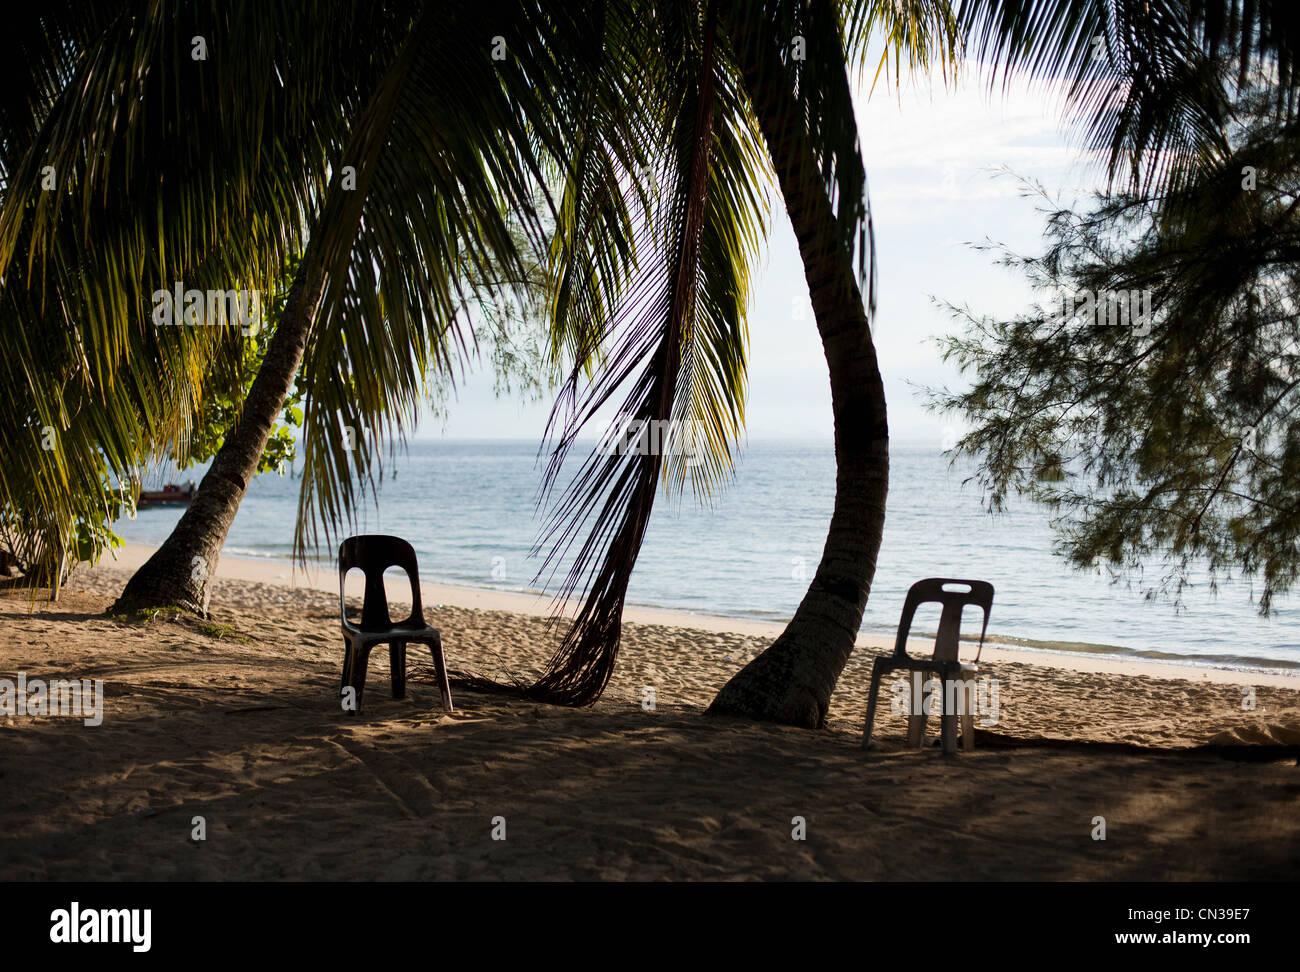 Chairs on a tropical beach, Tioman Island, Malaysia - Stock Image